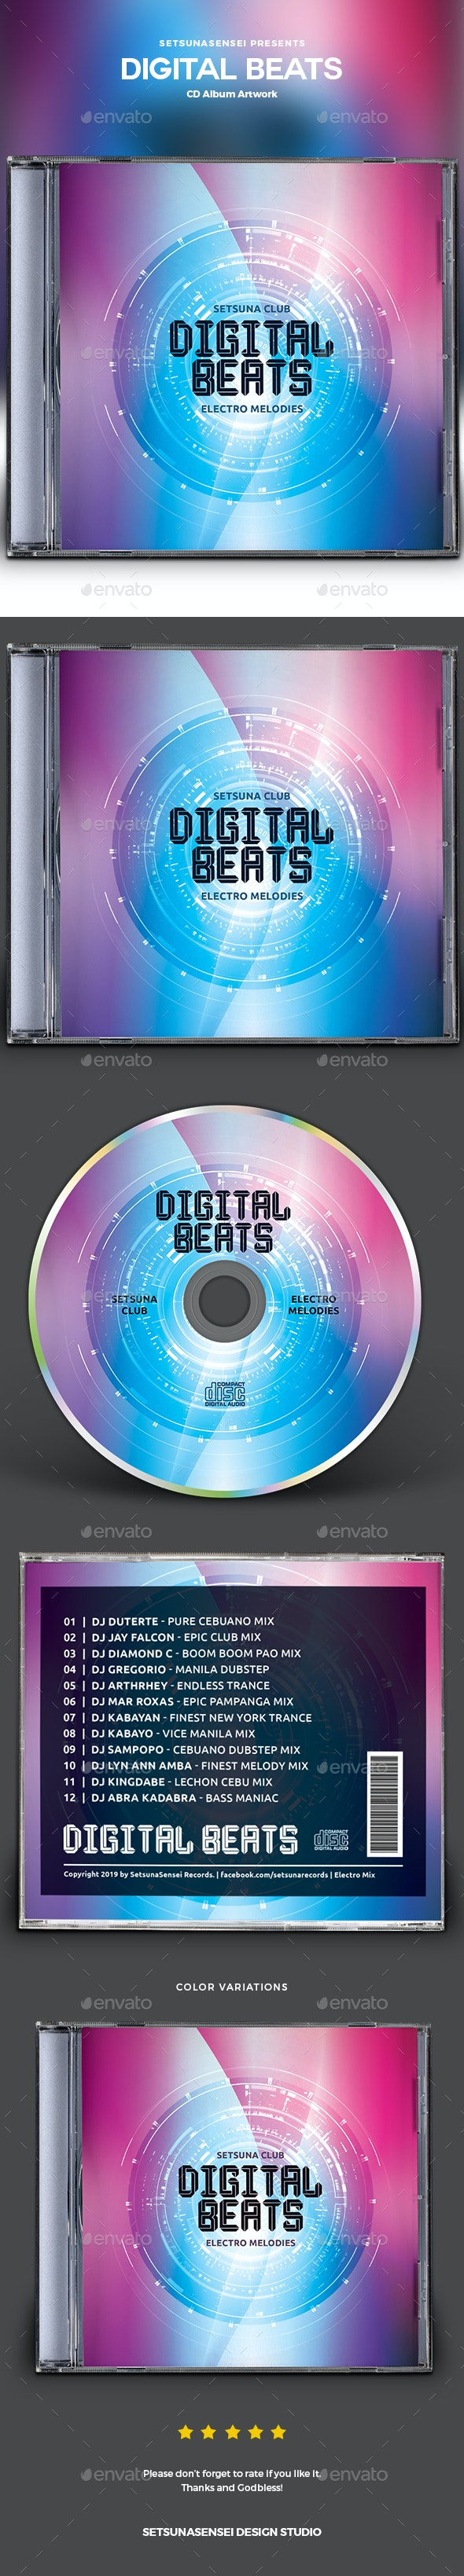 Digital Beats CD Album Artwork - CD & DVD Artwork Print Templates